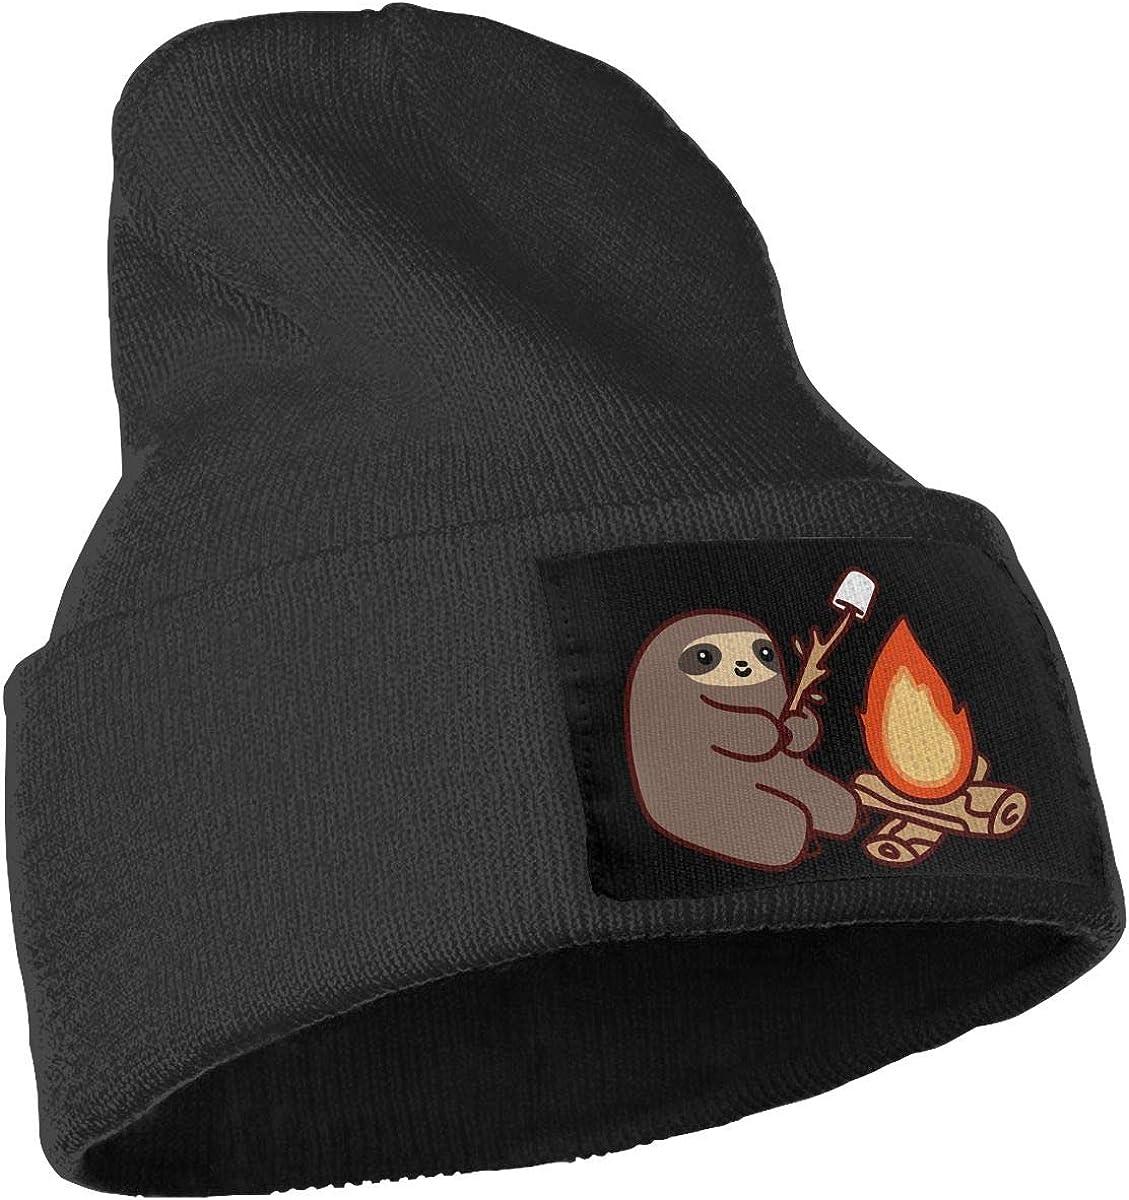 COLLJL-8 Men /& Women Campfire Sloth Outdoor Stretch Knit Beanies Hat Soft Winter Knit Caps